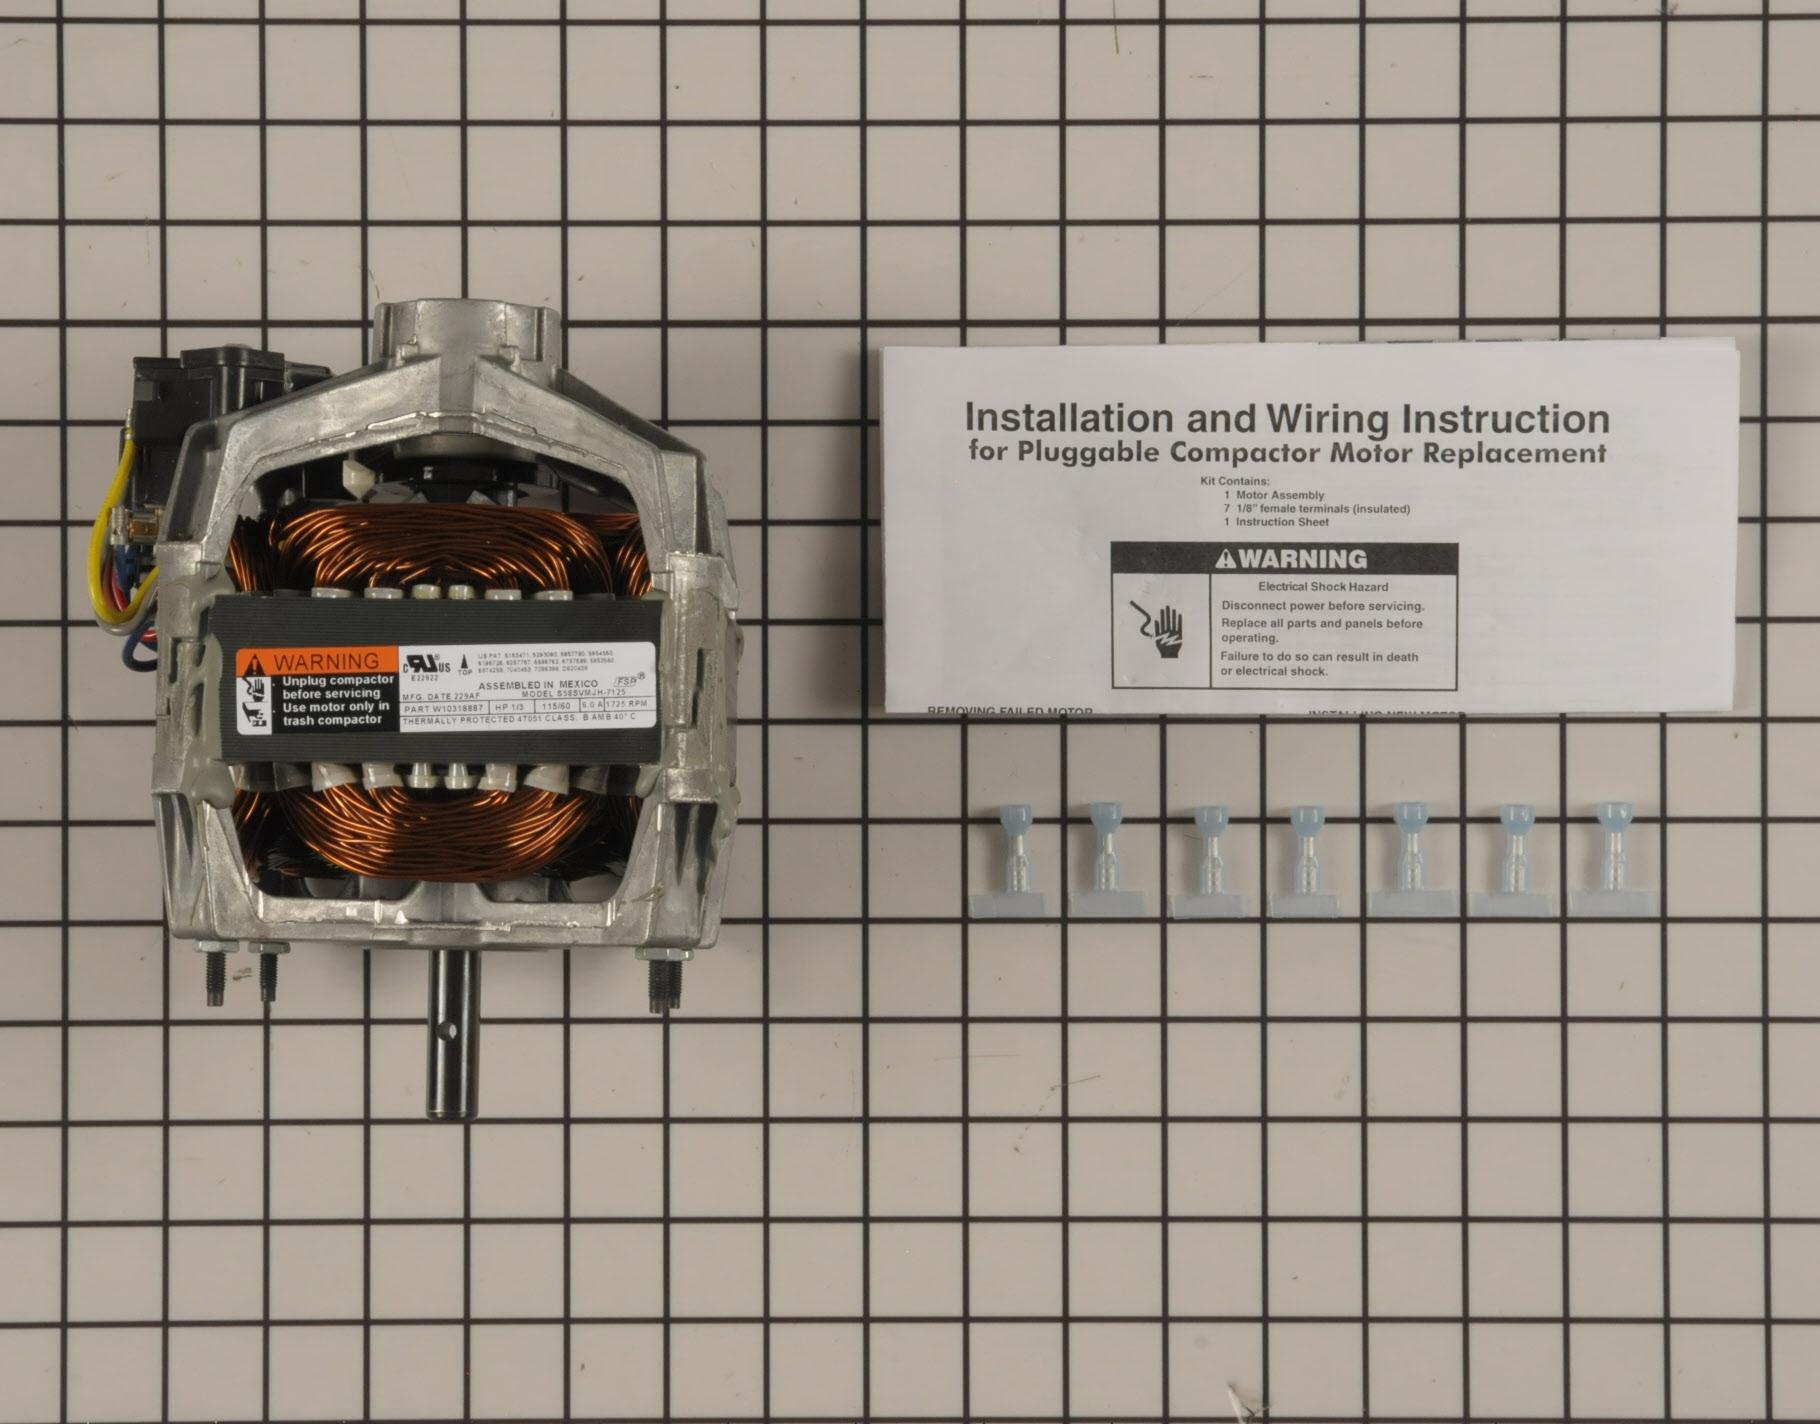 Maytag Trash Compactor Part # W10439651 - Drive Motor